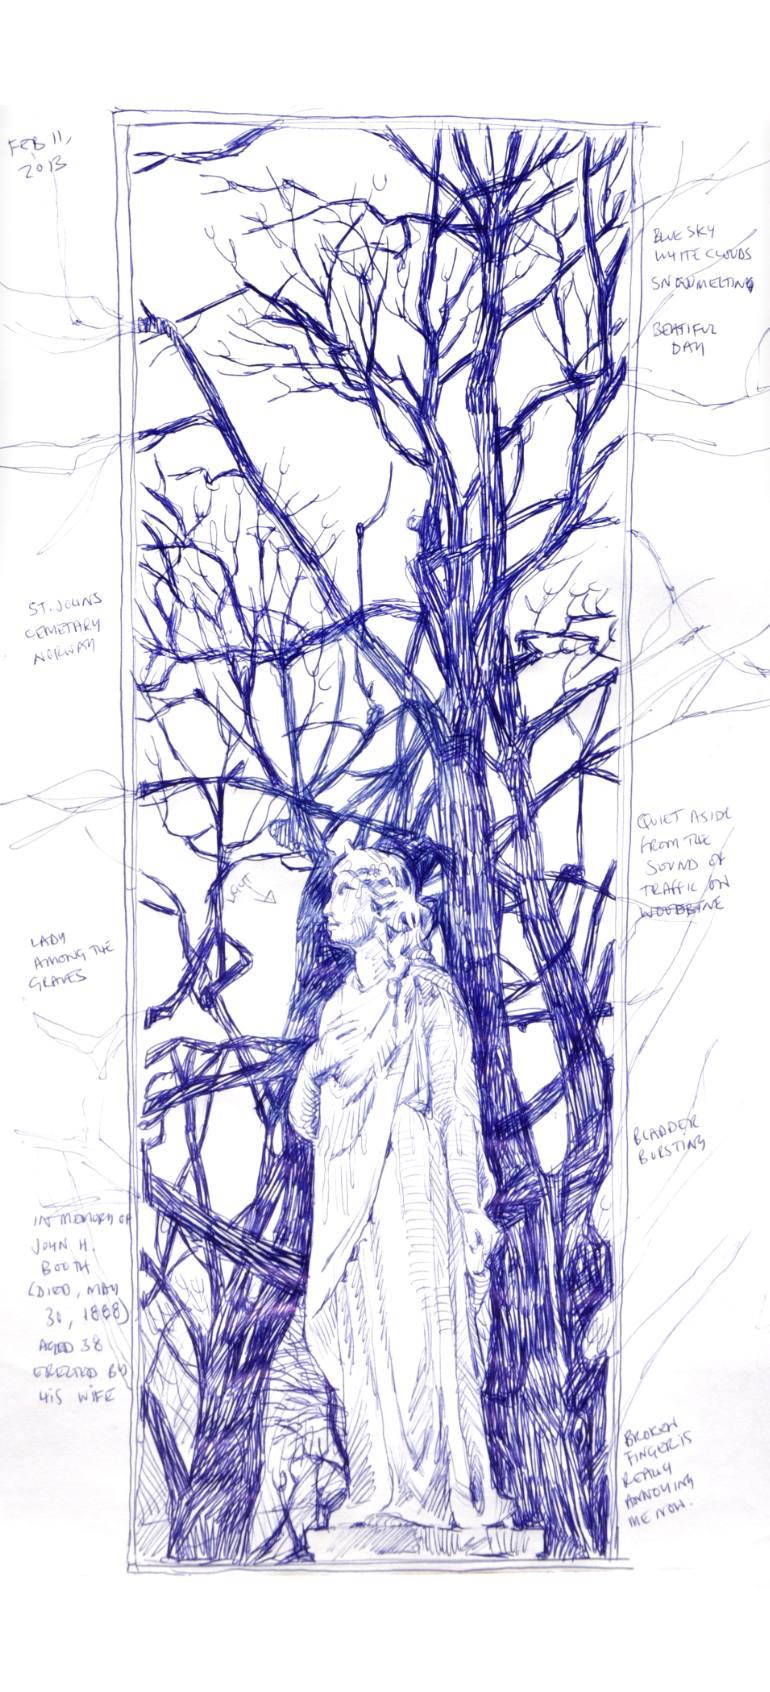 770x1692 Saatchi Art St. John's Cemetery Norway Drawing By Richard Johnson